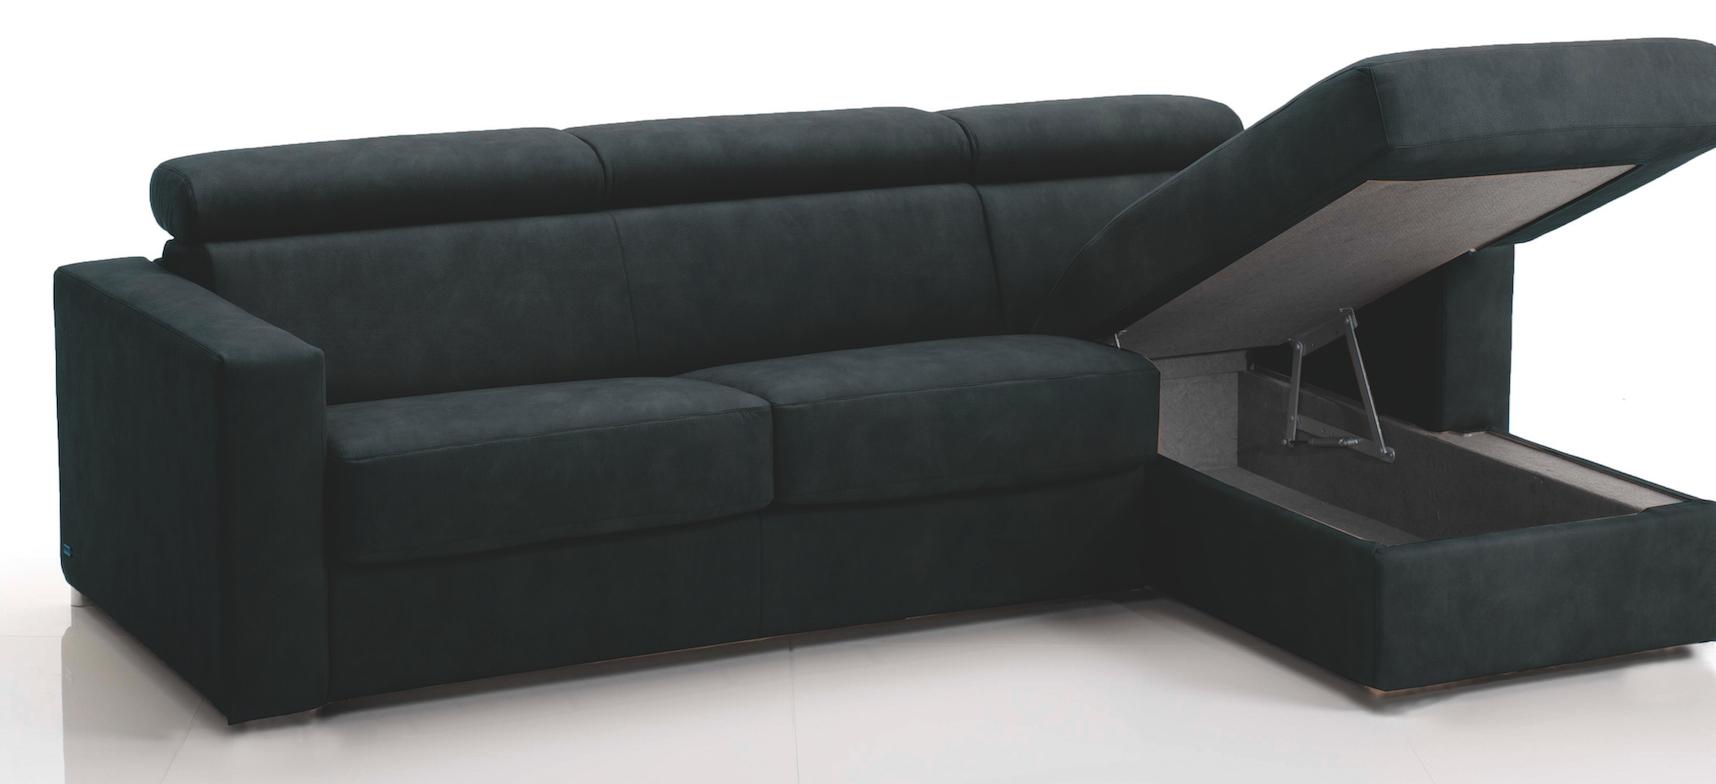 canap d 39 angle convertible avec t ti res rev tement microfibre noir lova mod le 3 places maxi. Black Bedroom Furniture Sets. Home Design Ideas